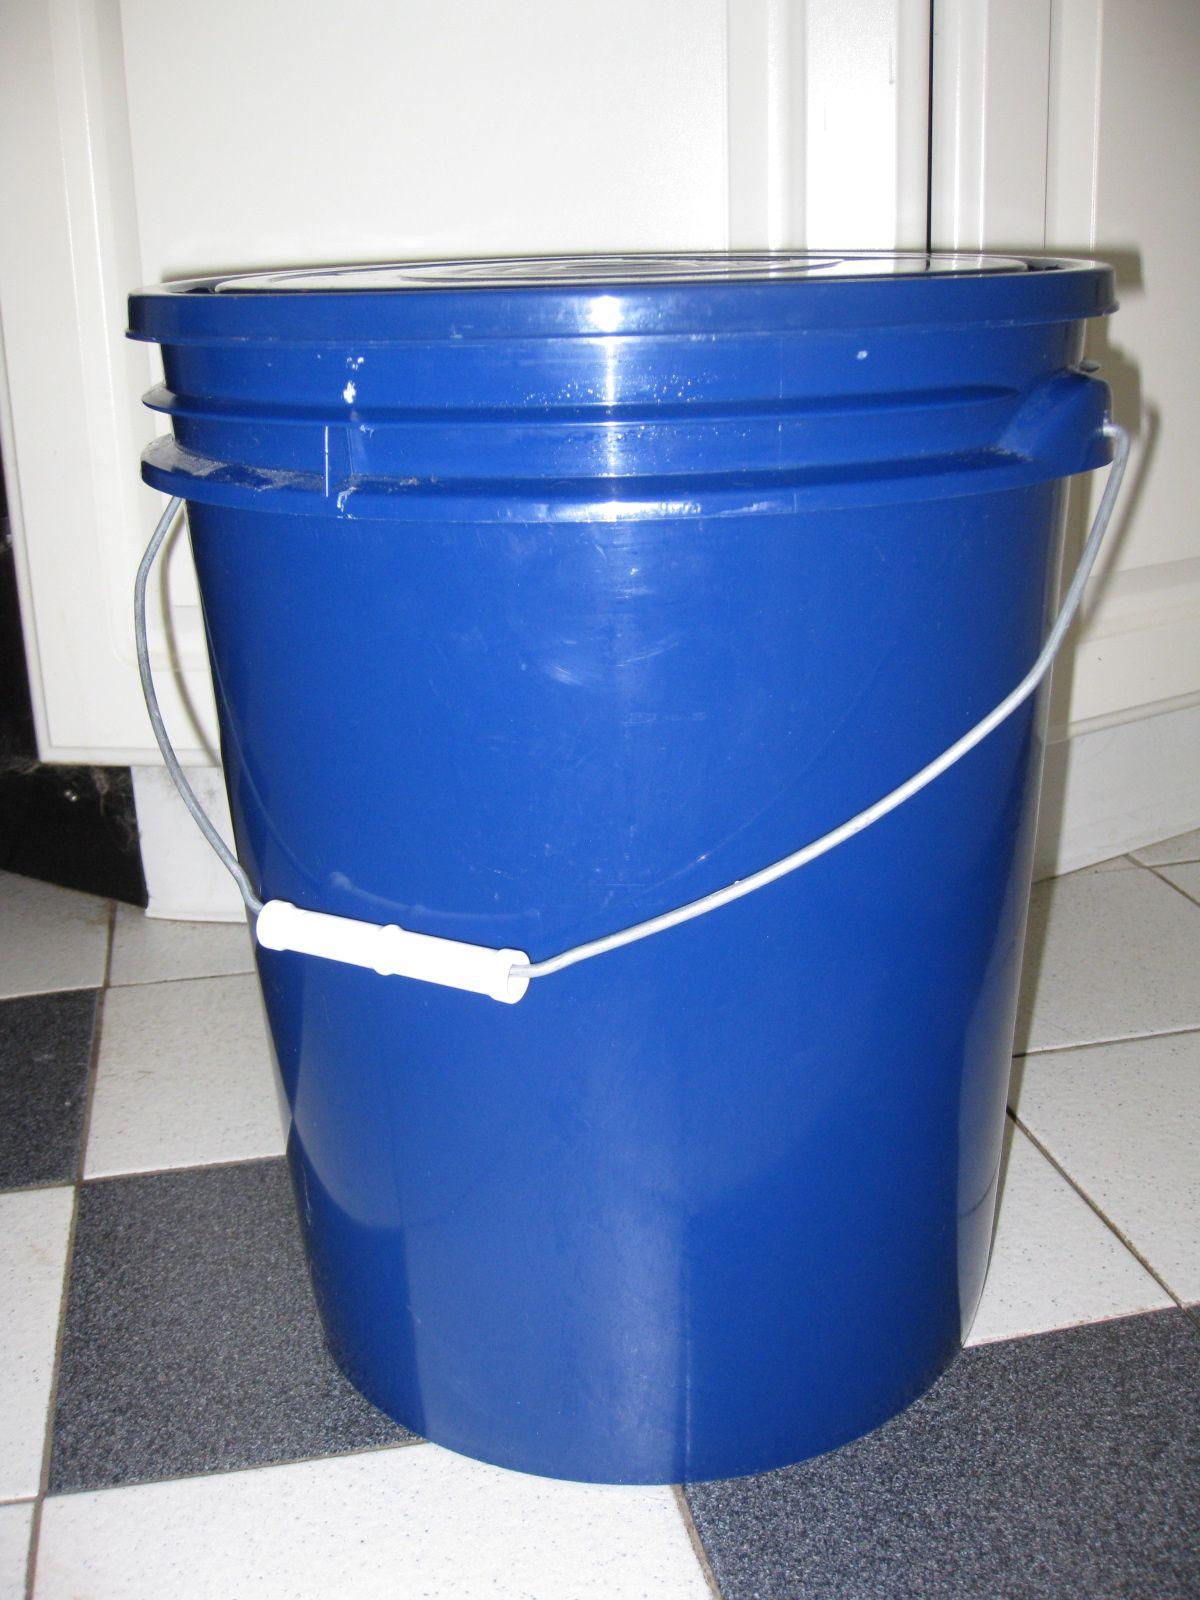 5 gallon bucket with lid Bucket With Lid, 5 Gallon Buckets, Homemade Laundry Detergent